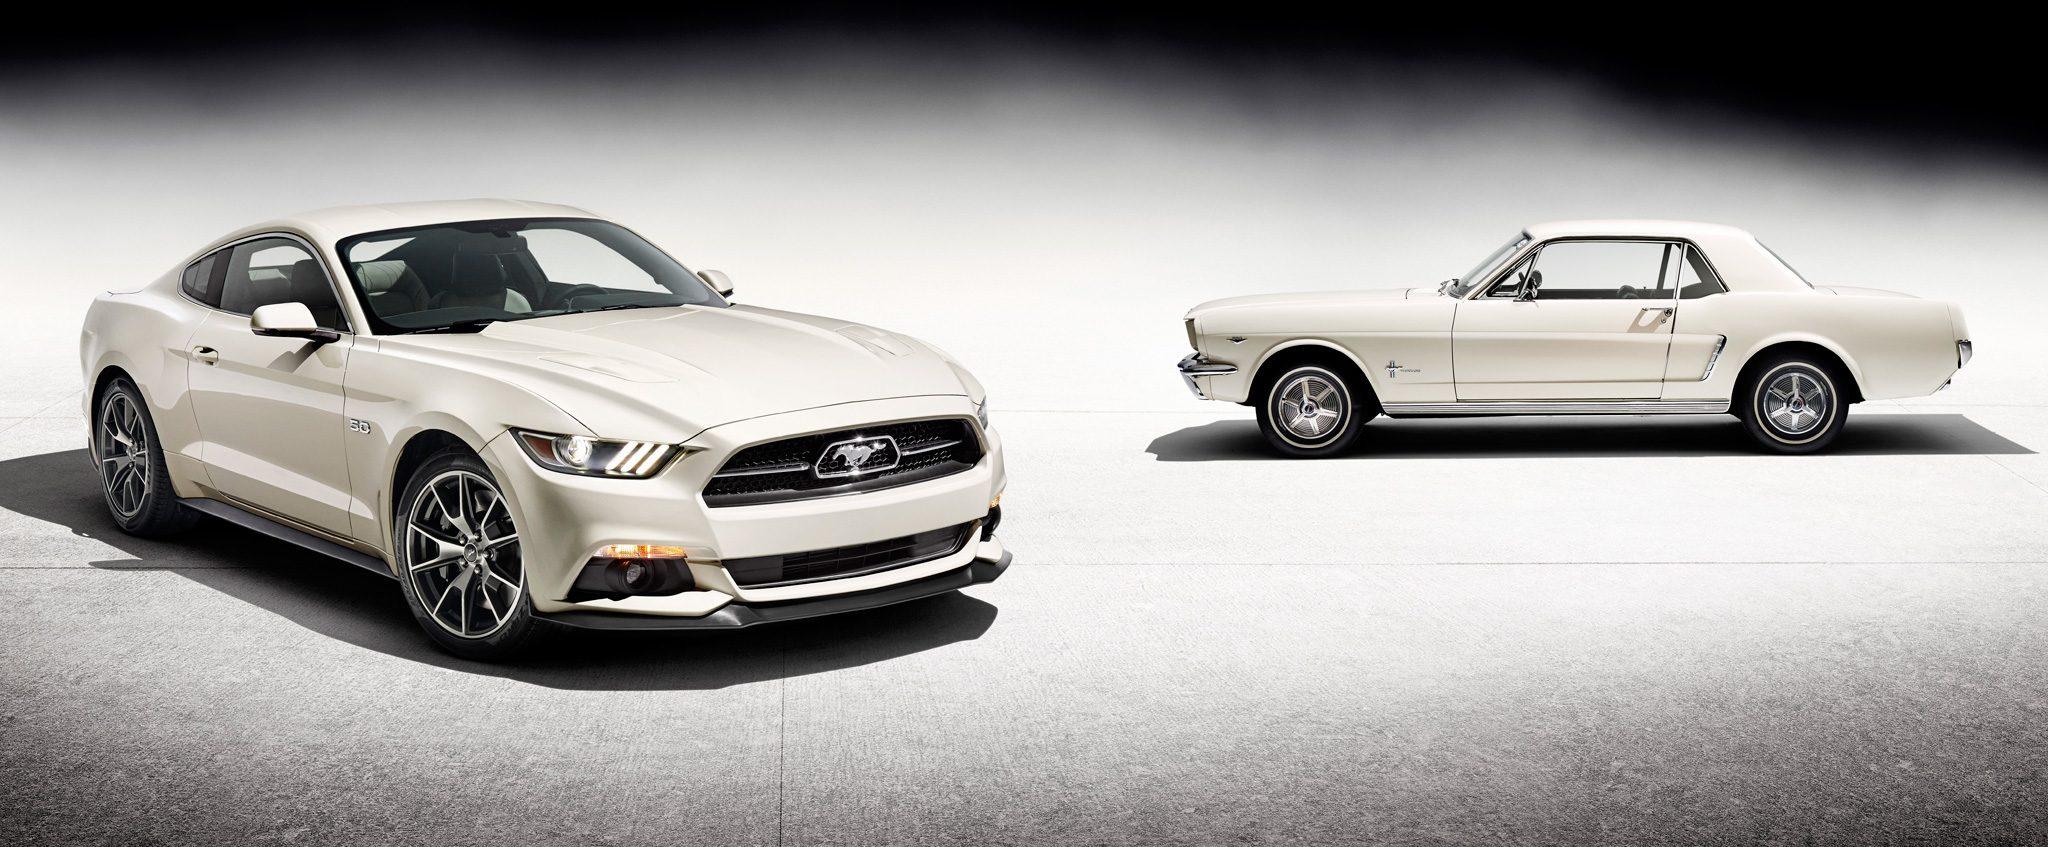 Ford Mustang GT 50th Anniversary.jpg